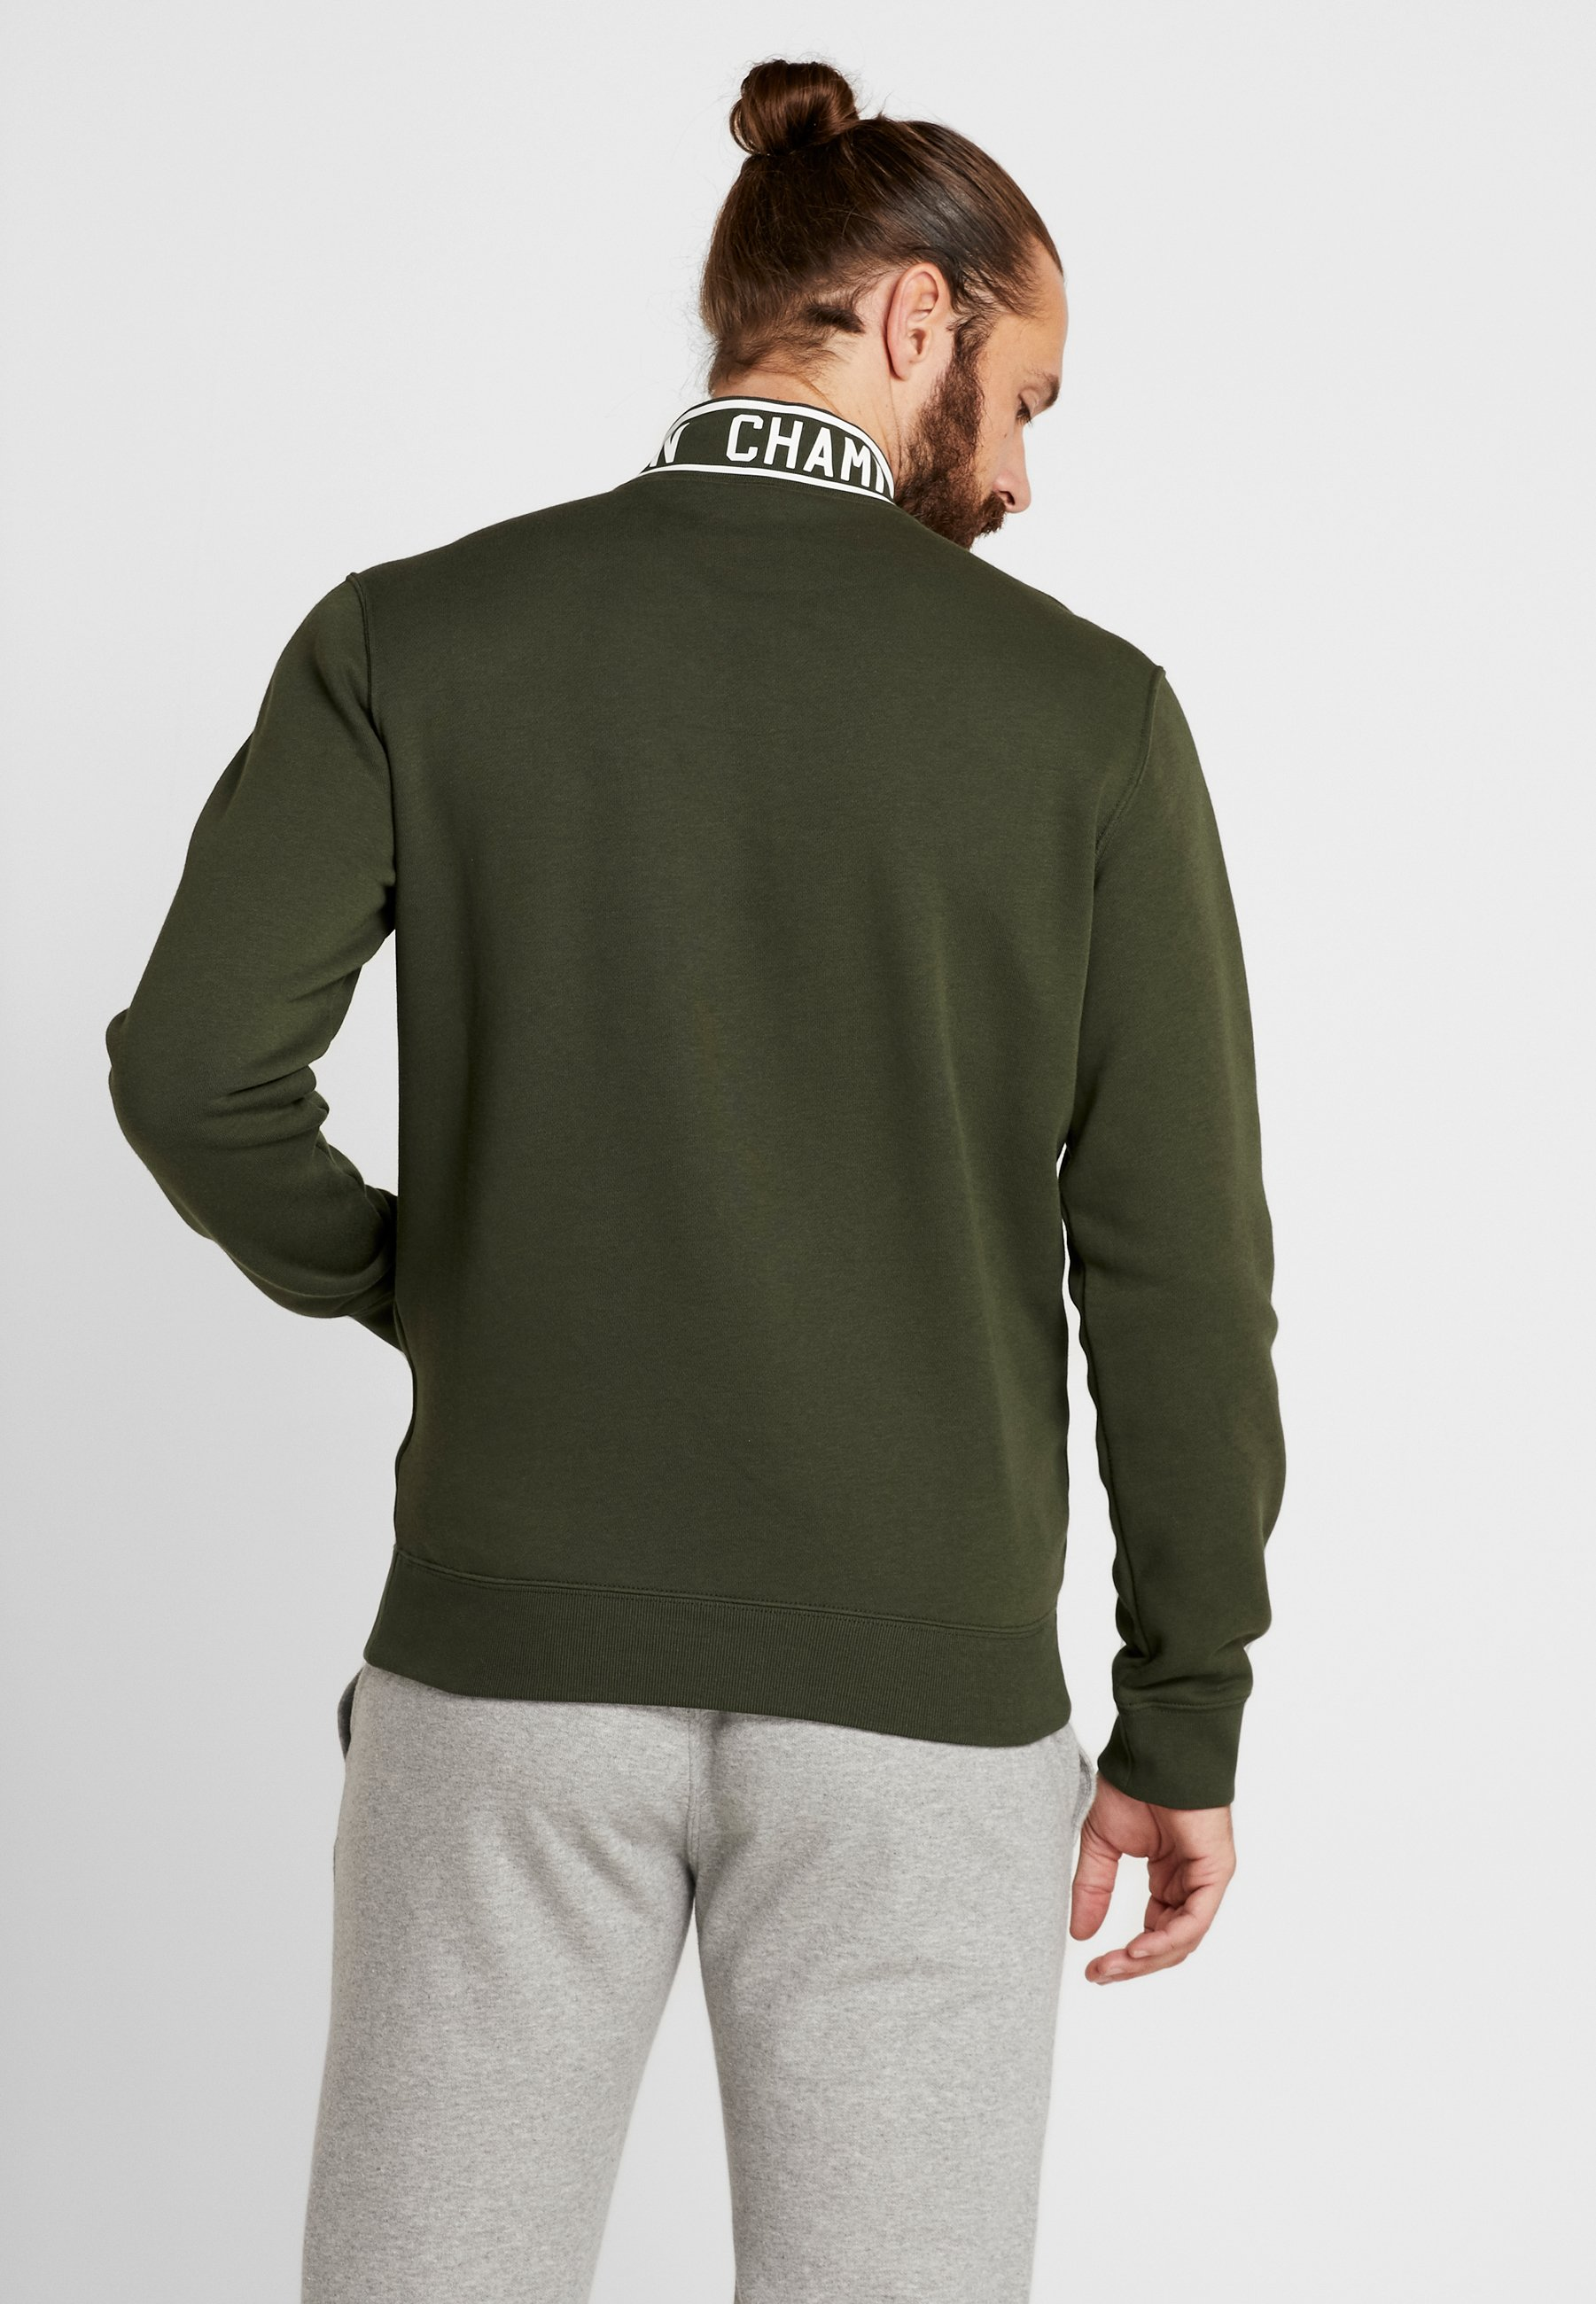 Green Half Half Dark Champion Dark ZipSweatshirt ZipSweatshirt Champion Dark Green Champion Half ZipSweatshirt stdxhQrC